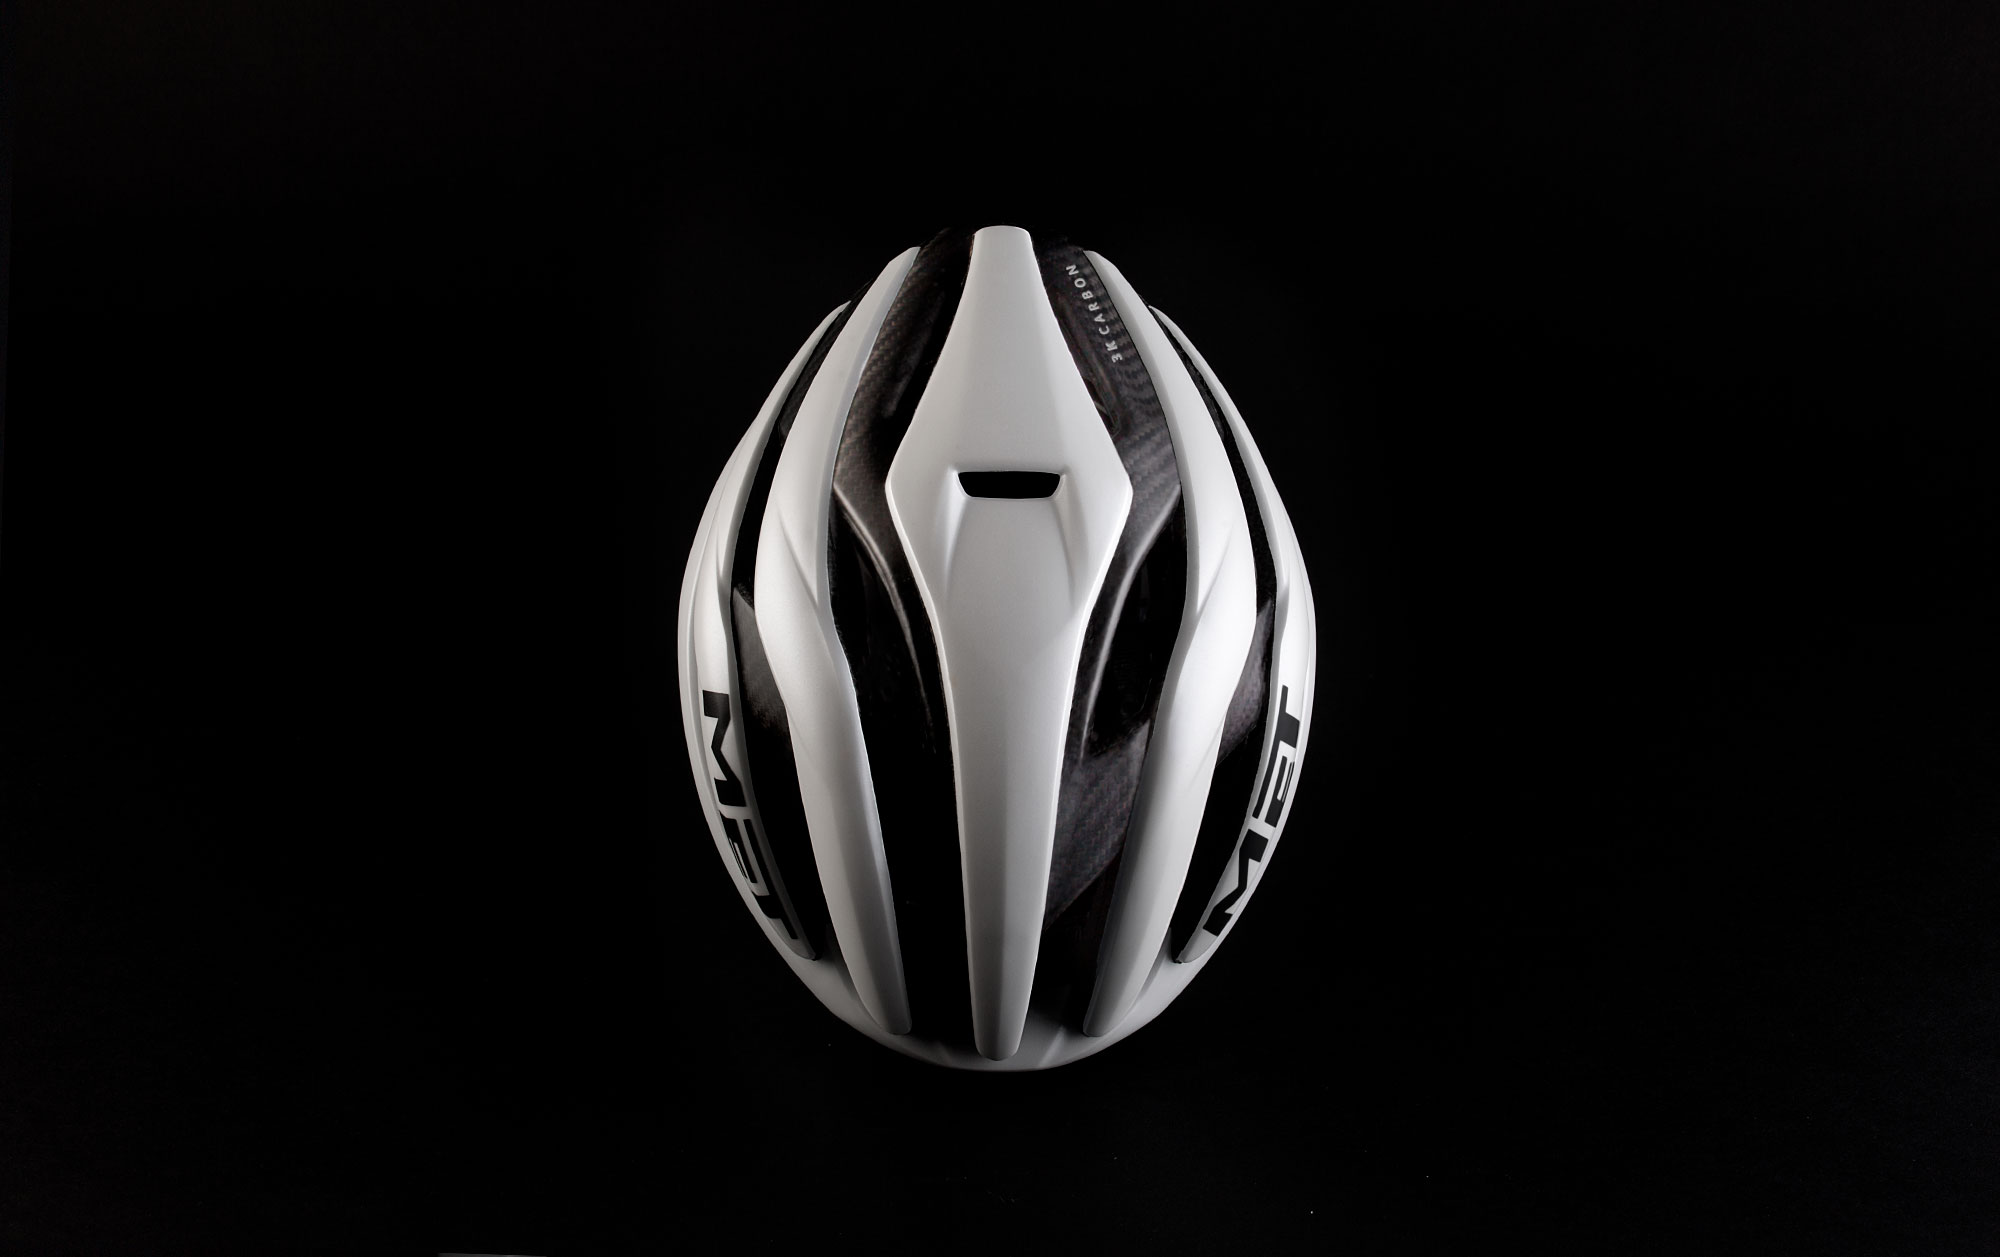 MET Trenta 3K Carbon Road, Aero, Cyclocross and Gravel Helmet 3k carbon technology